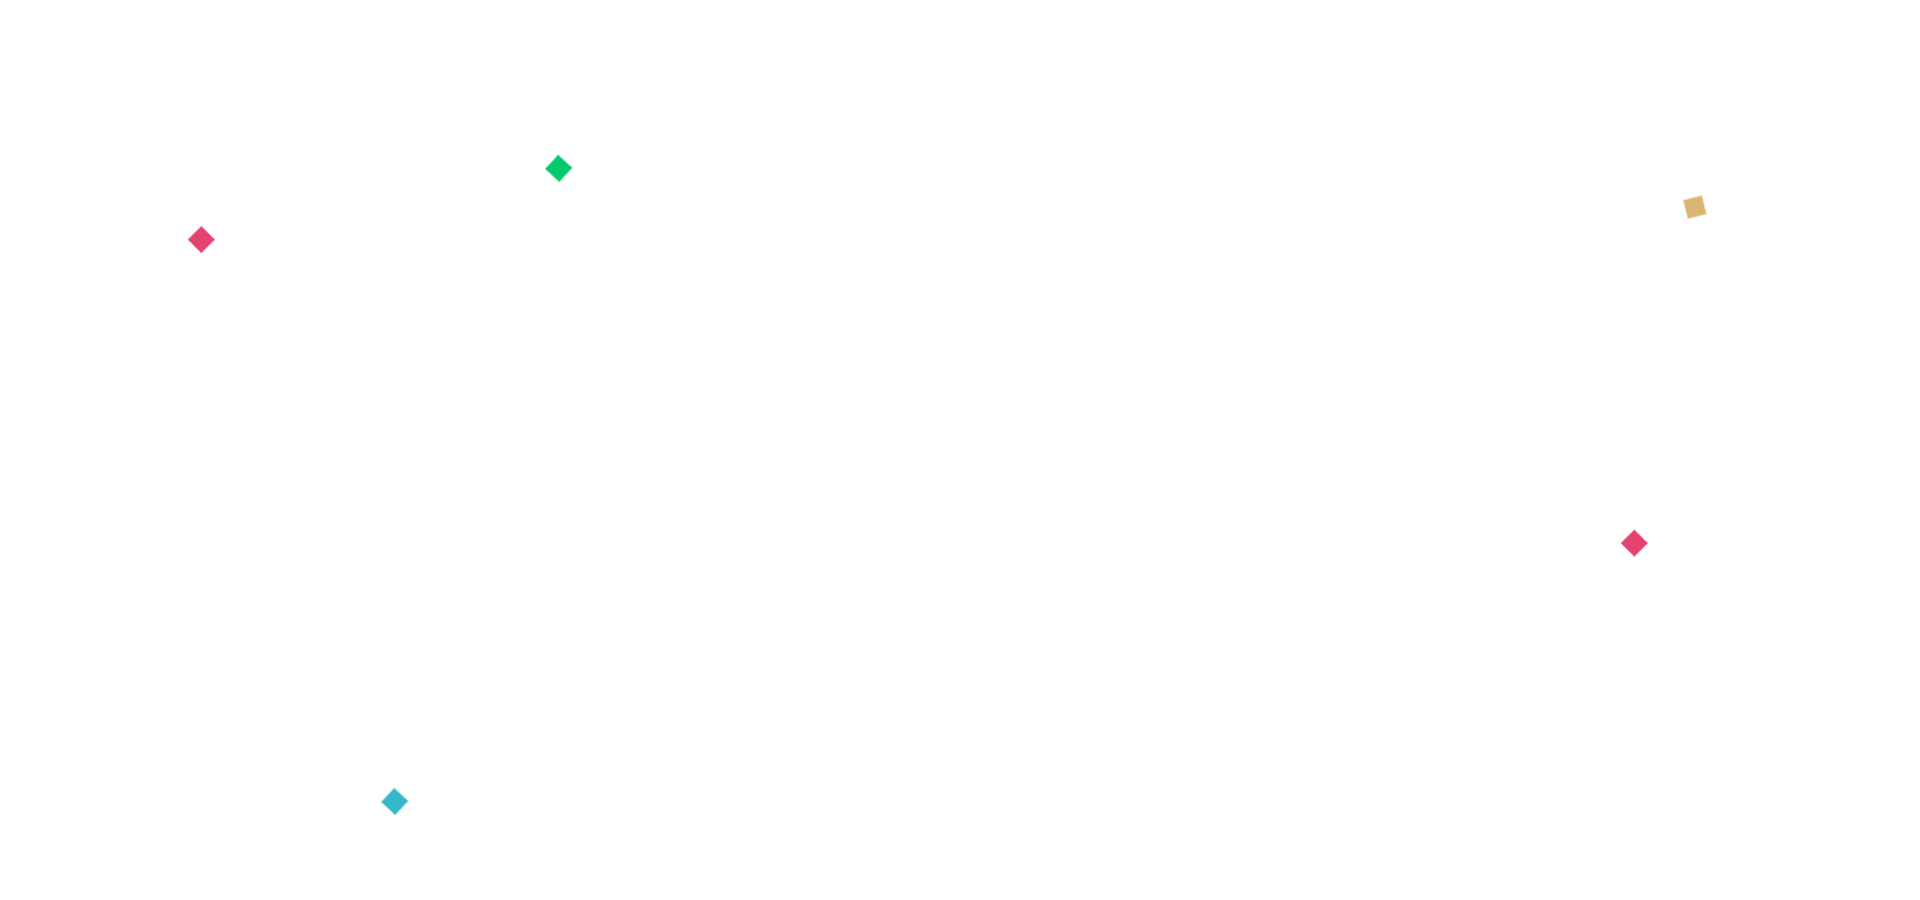 pattern_background6